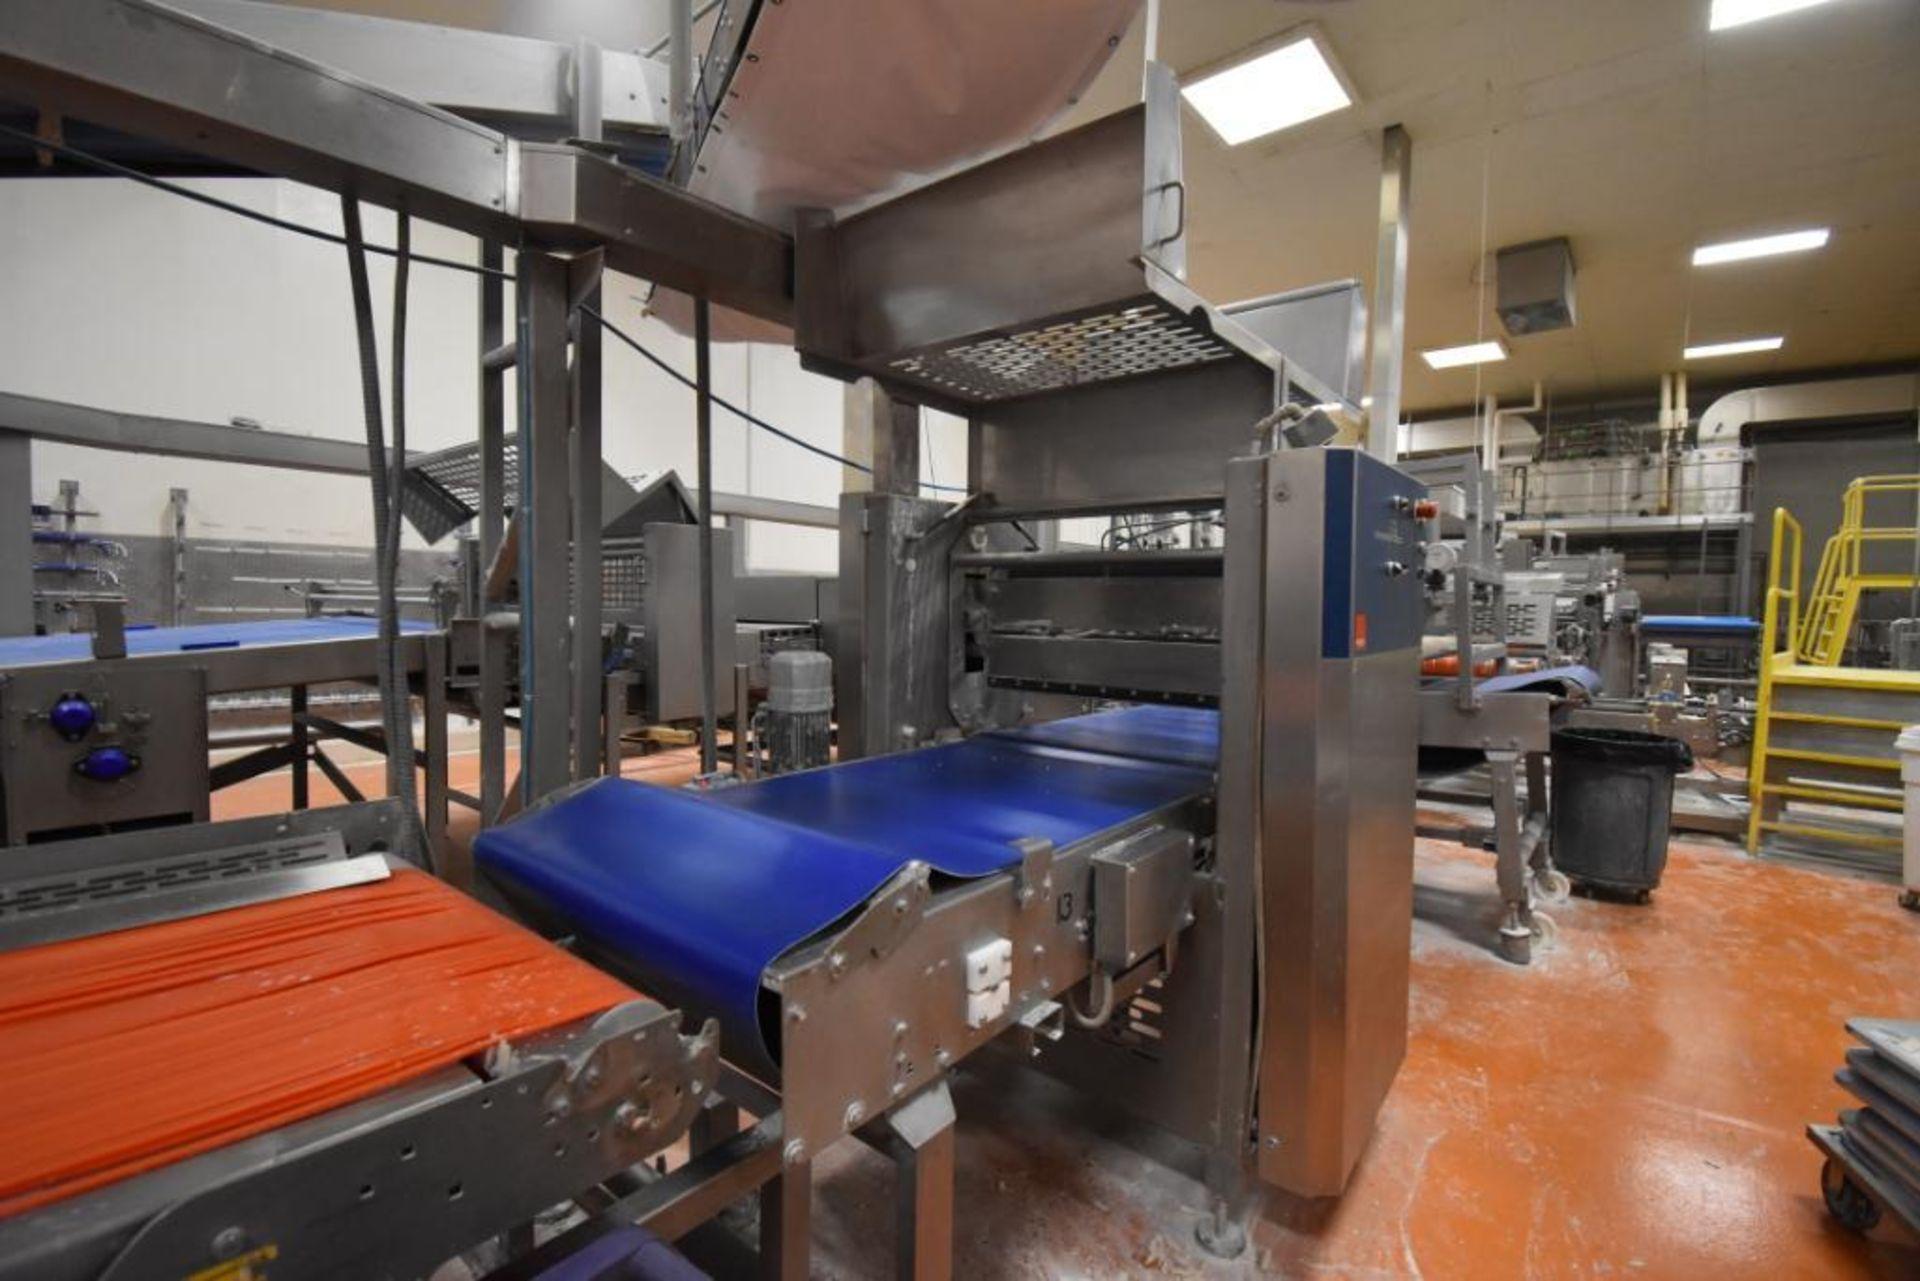 2007 Fritsch Laminator 3000 dough line - Image 160 of 280